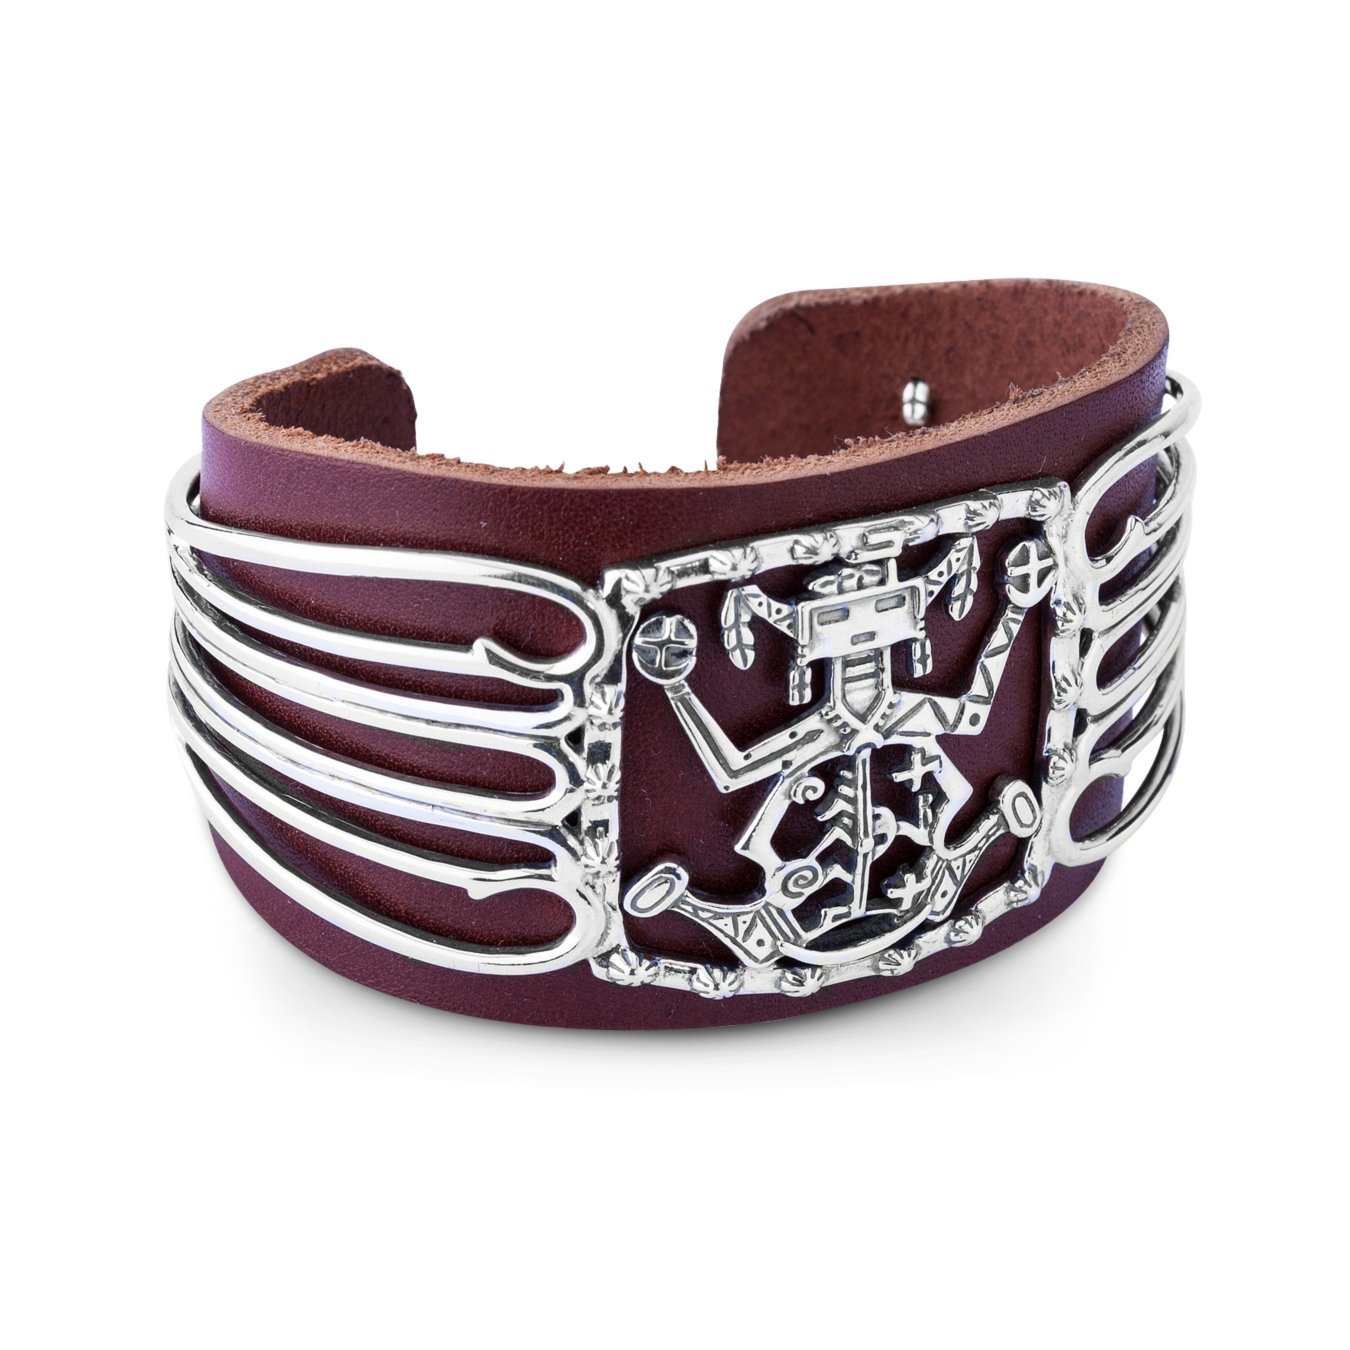 Fritz Casuse Brown Leather Spirit Figure Cuff Bracelet, Medium by American West